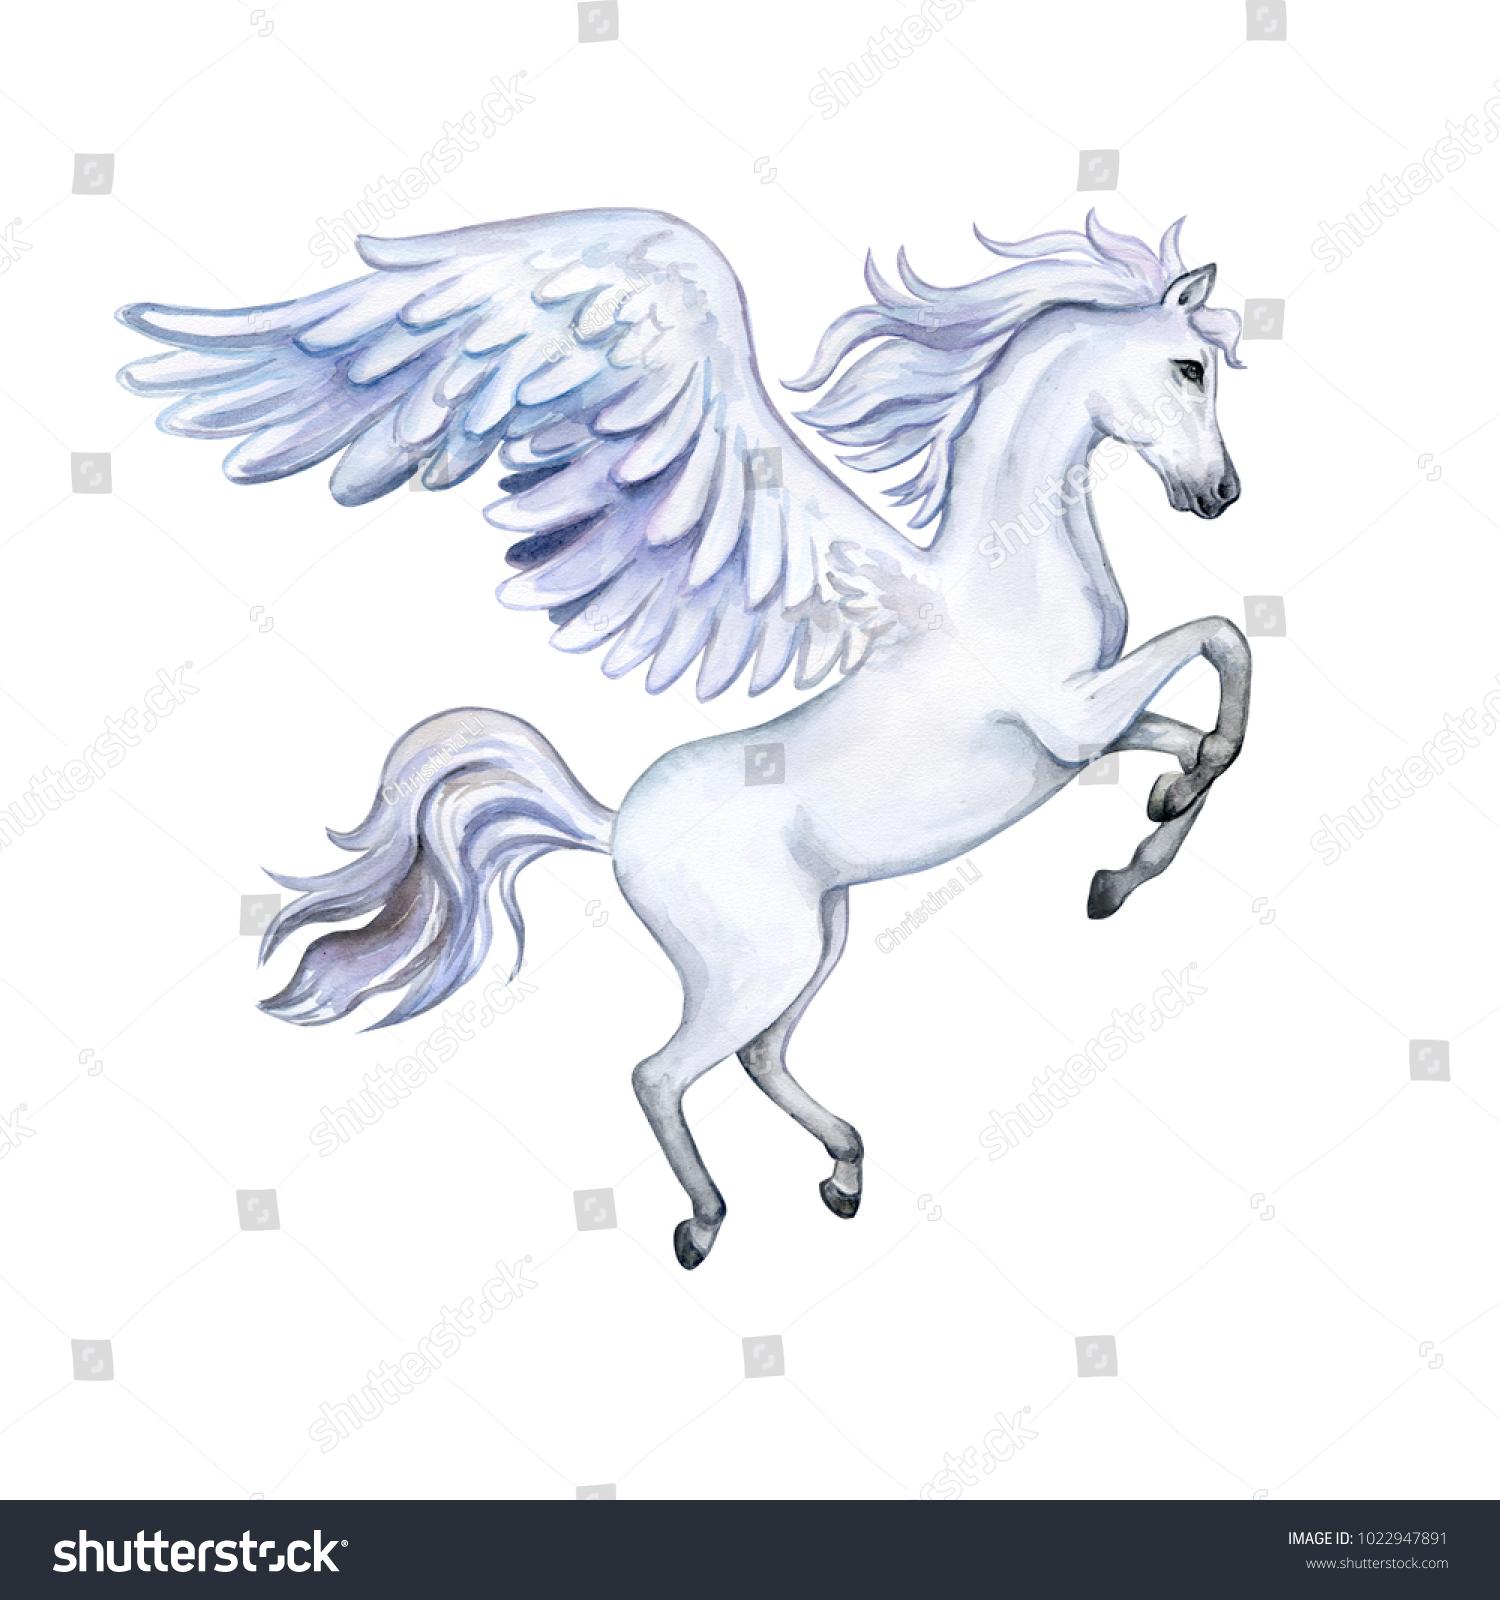 Pegasus Wings Isolated On White Background Stock Illustration 1022947891